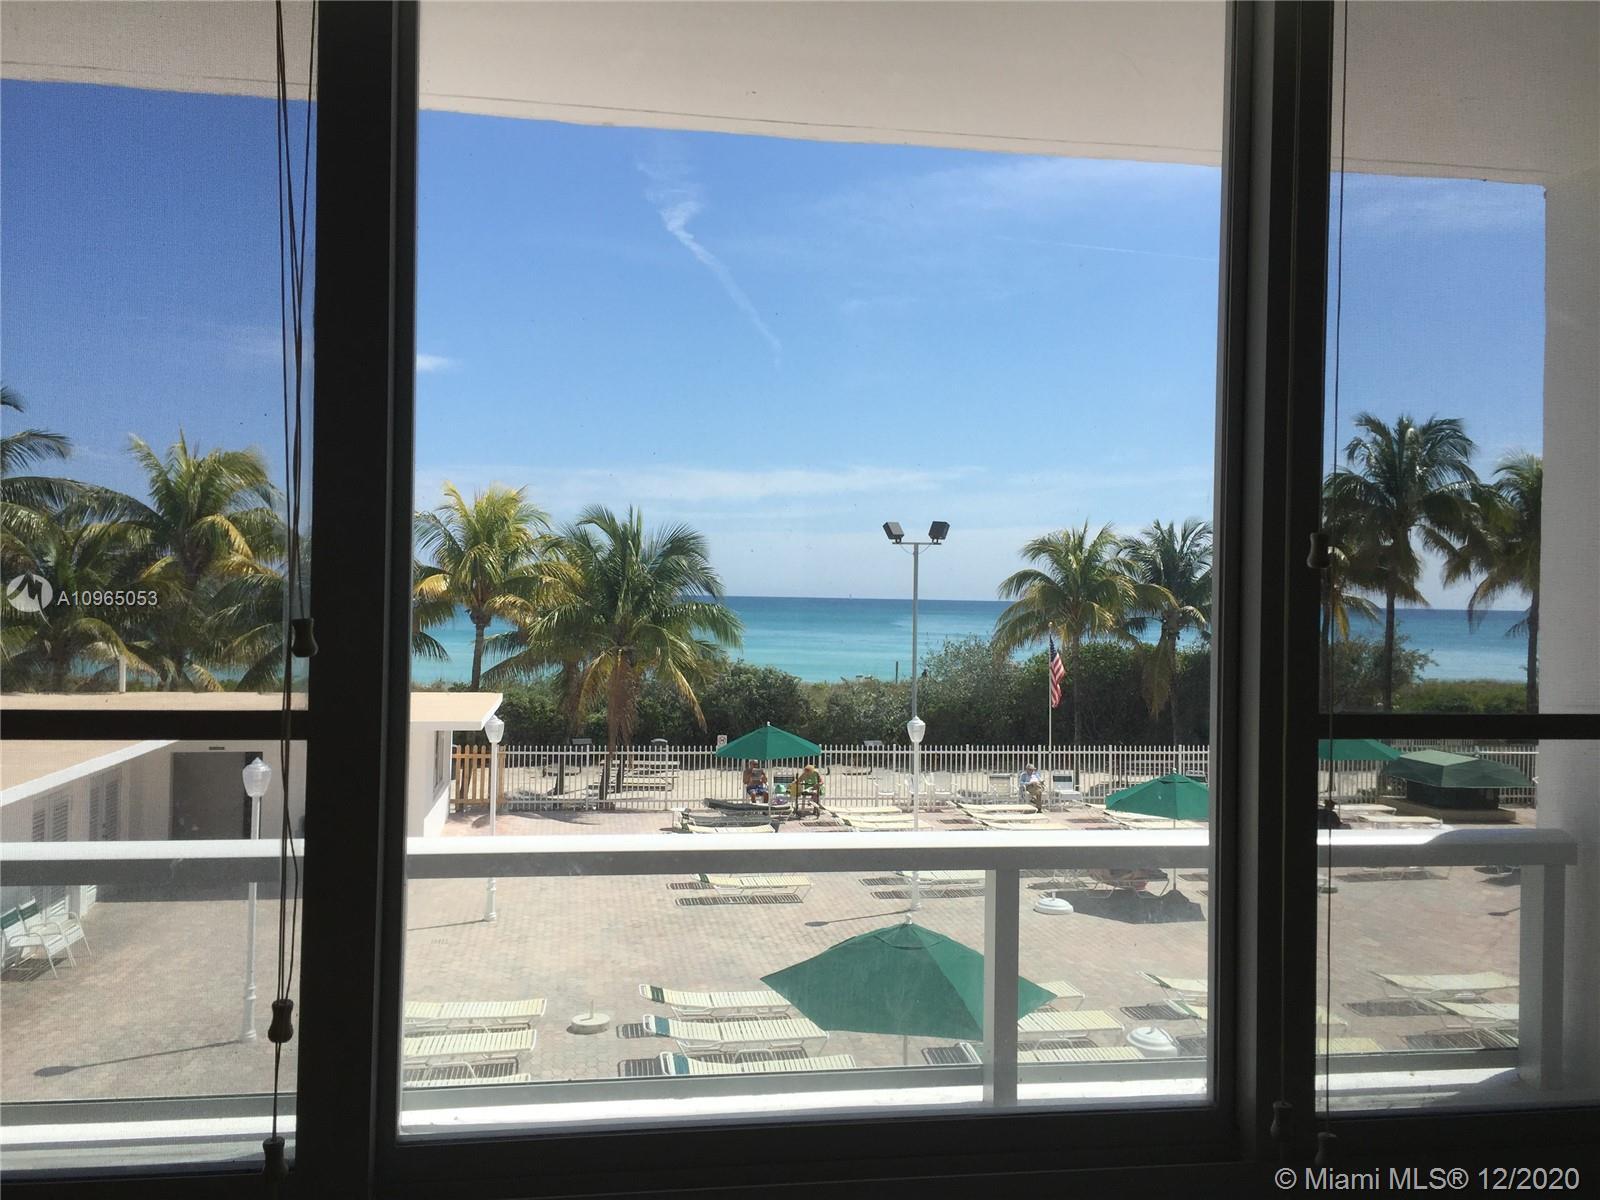 Carriage Club North Tower #220 - 5005 Collins Ave #220, Miami Beach, FL 33140